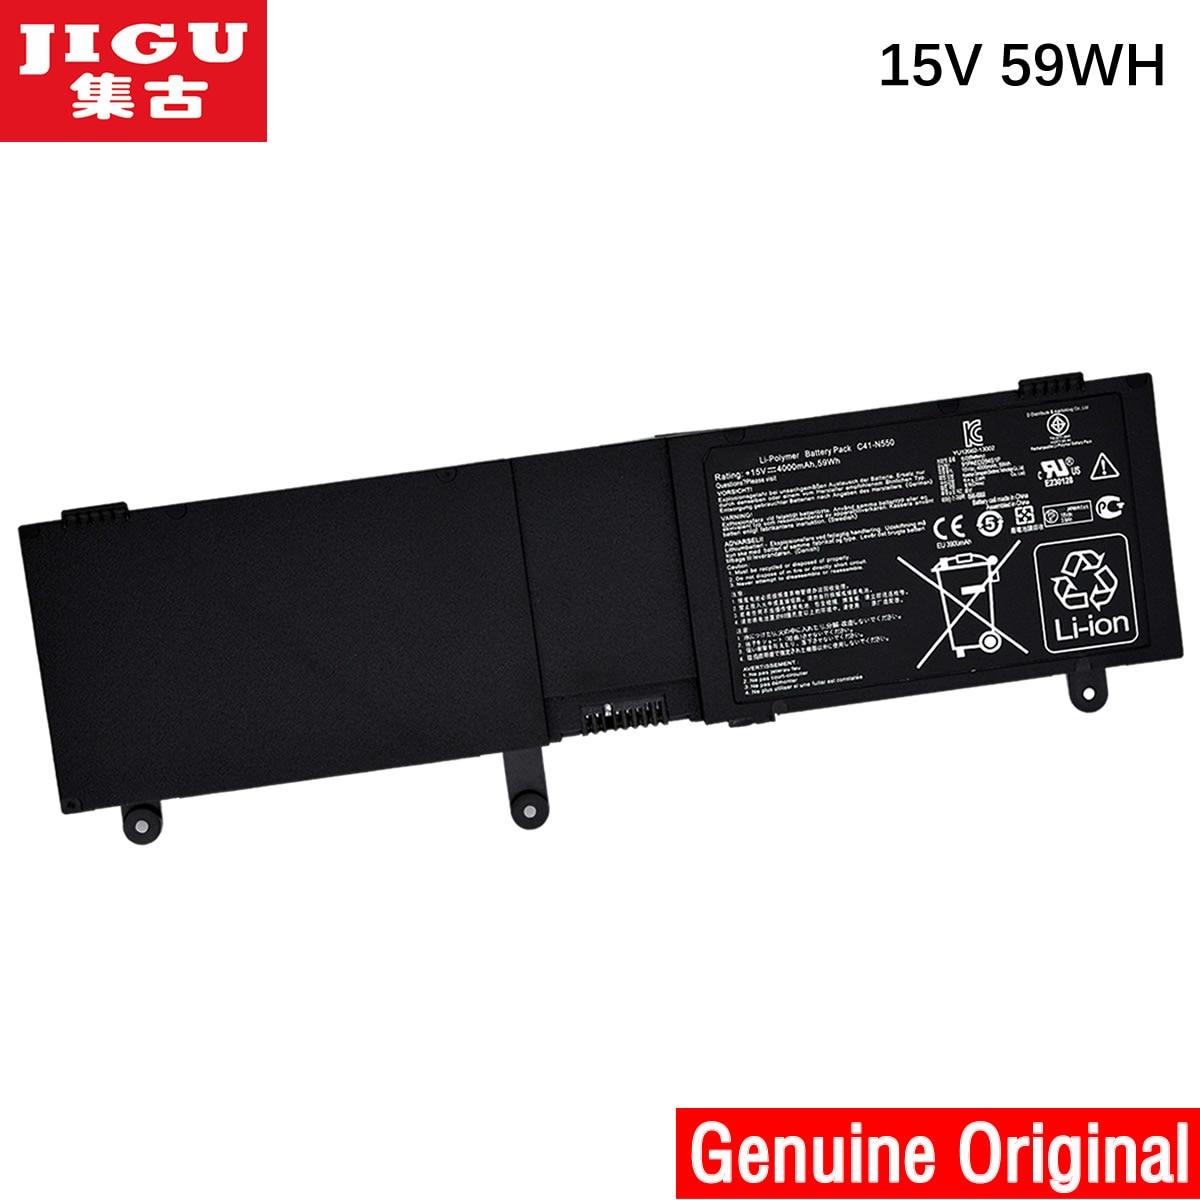 C41 N550 батареи для ноутбука JIGU для ASUS G550 G550J G550JK G550JK4700 N550JK N550JV ROG G550 G550J G550JK Series